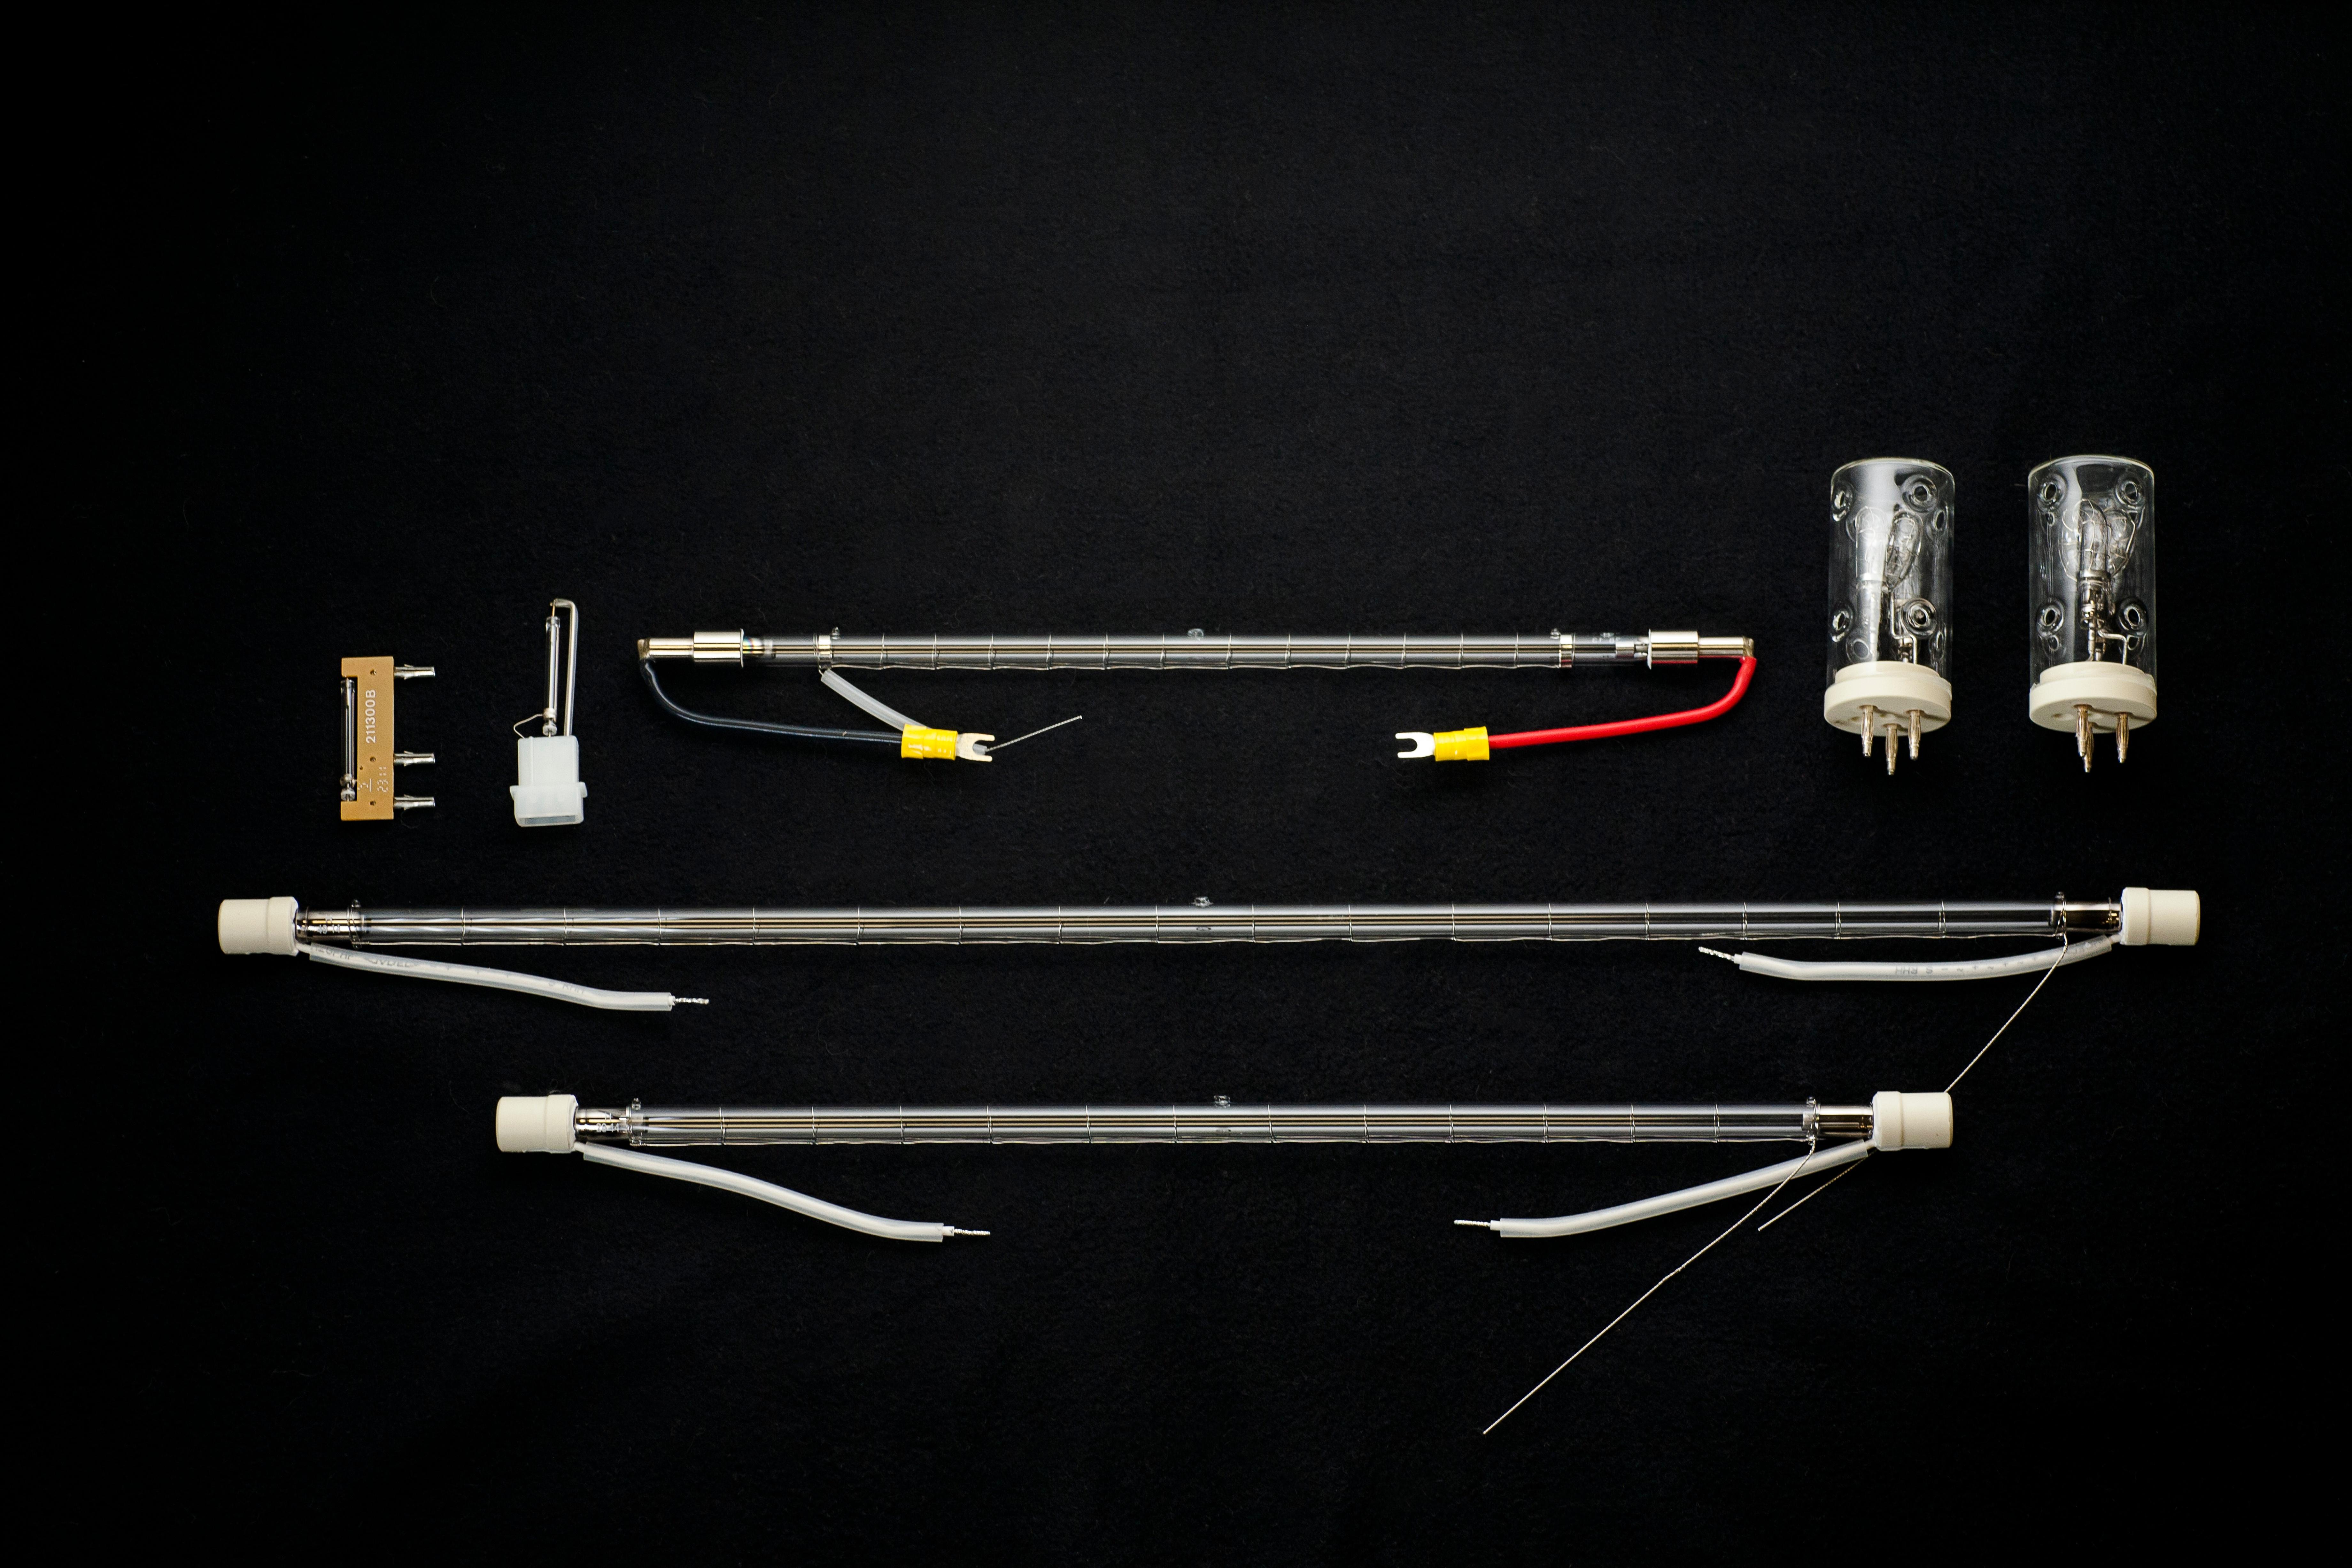 xenon-lamps-1.jpg